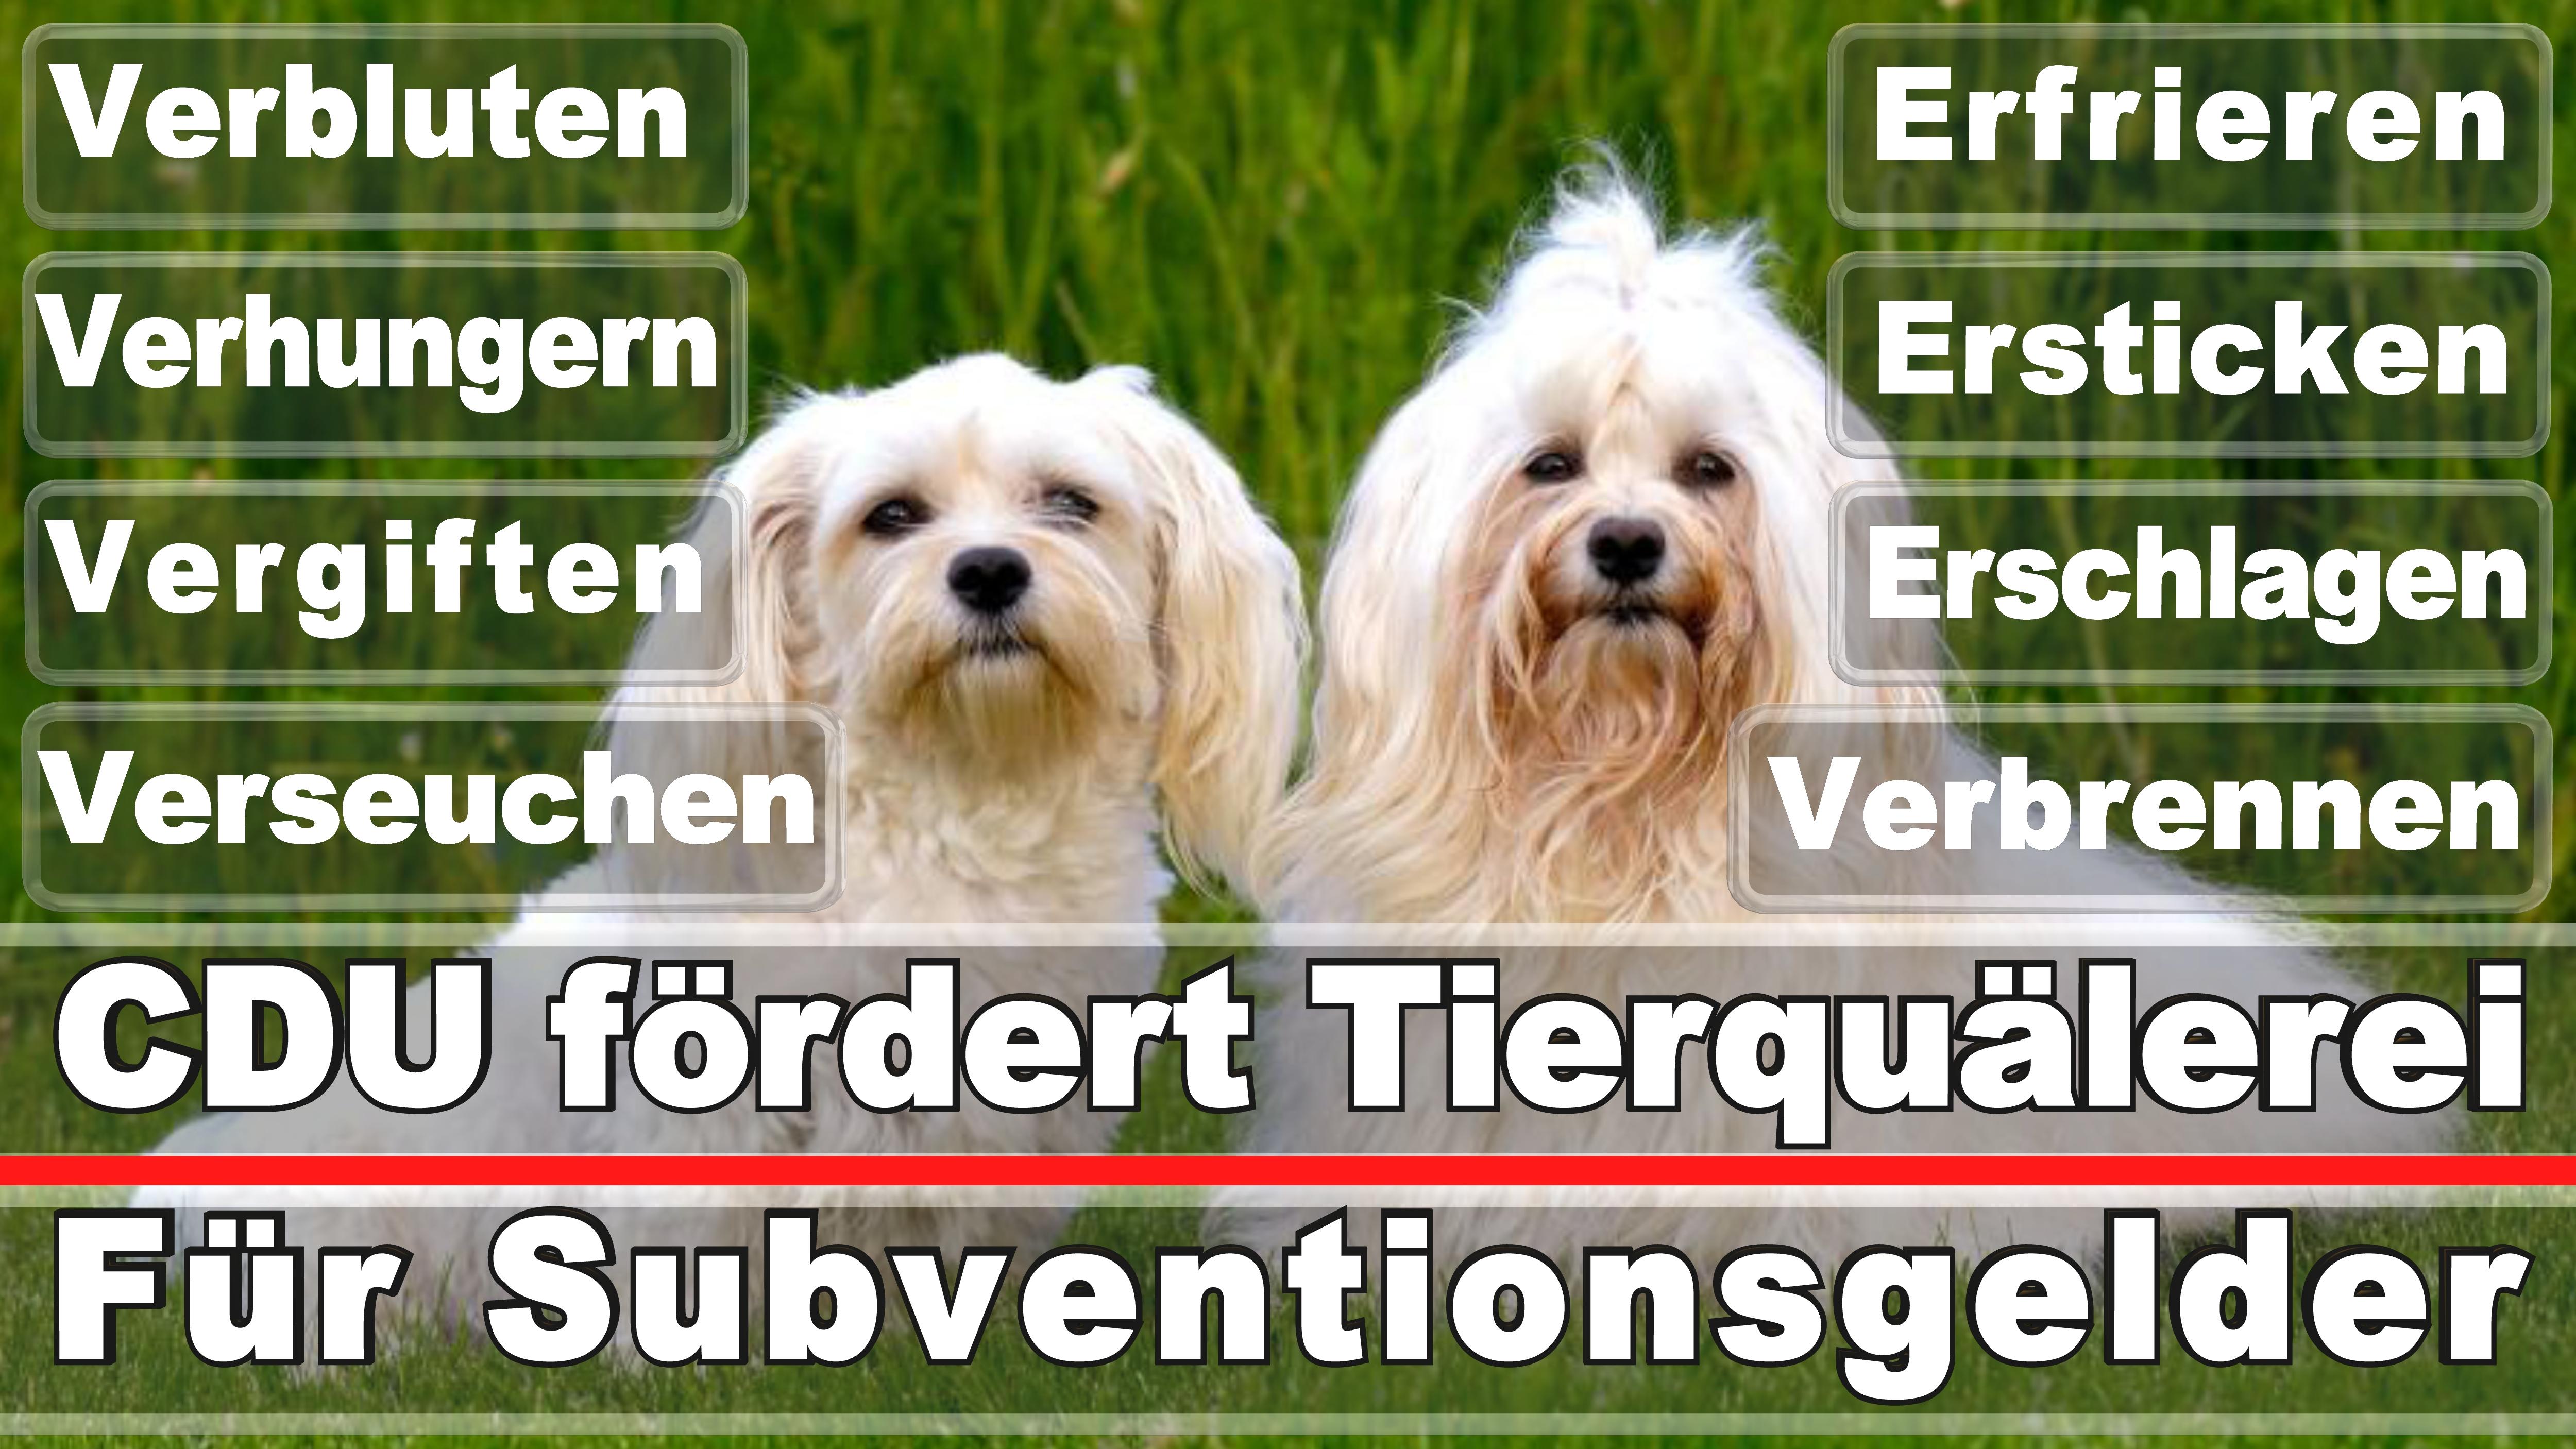 Landtagswahl-Bundestagswahl-CDU-SPD-FDP-AFD-Linke-Piraten-Tierschutzpartei (41)